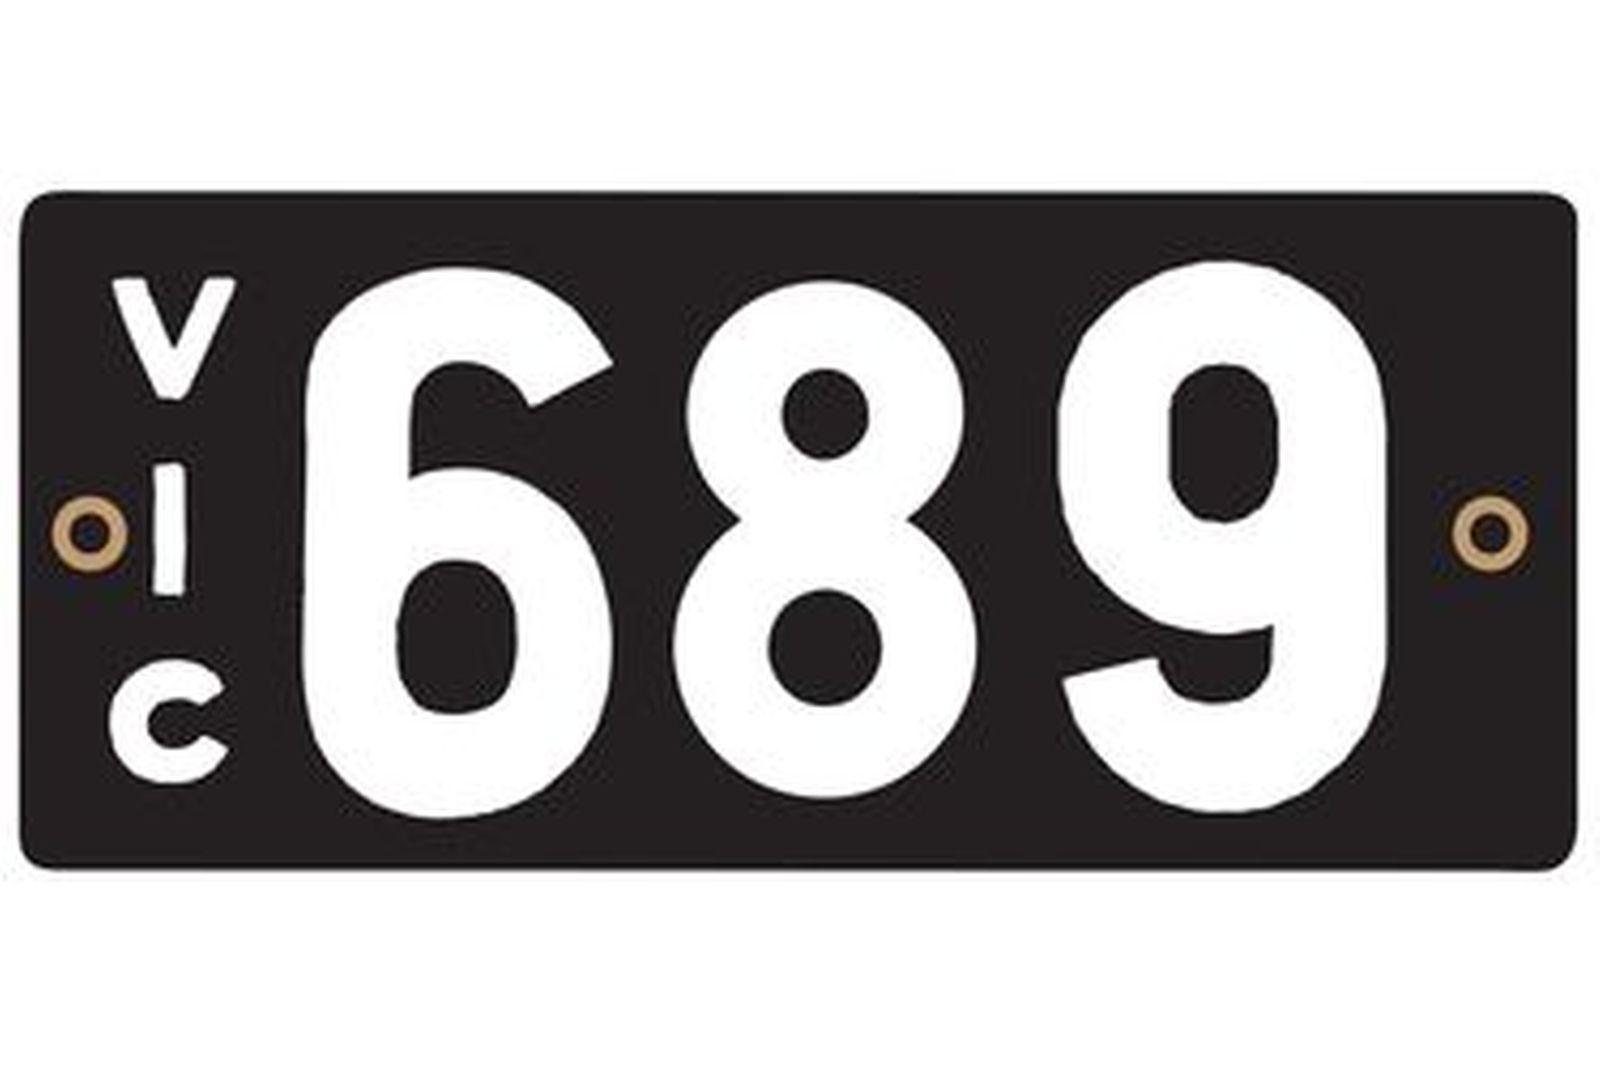 Victorian Heritage Plate '689'